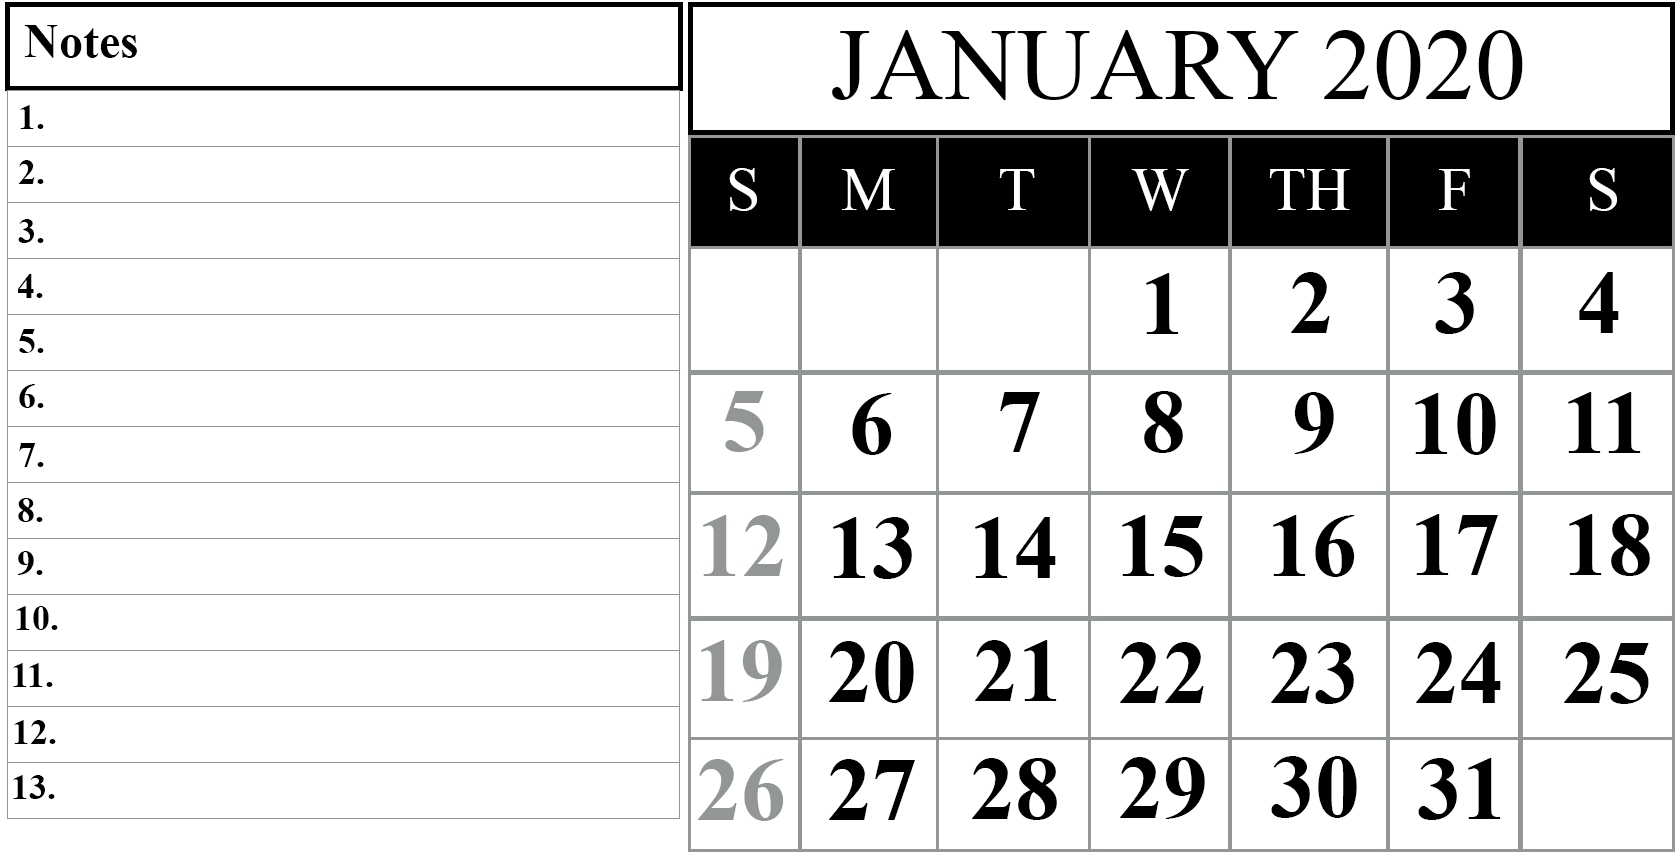 Free January 2020 Printable Calendar In Pdf, Excel & Word-Fillable January 2020 Calendar